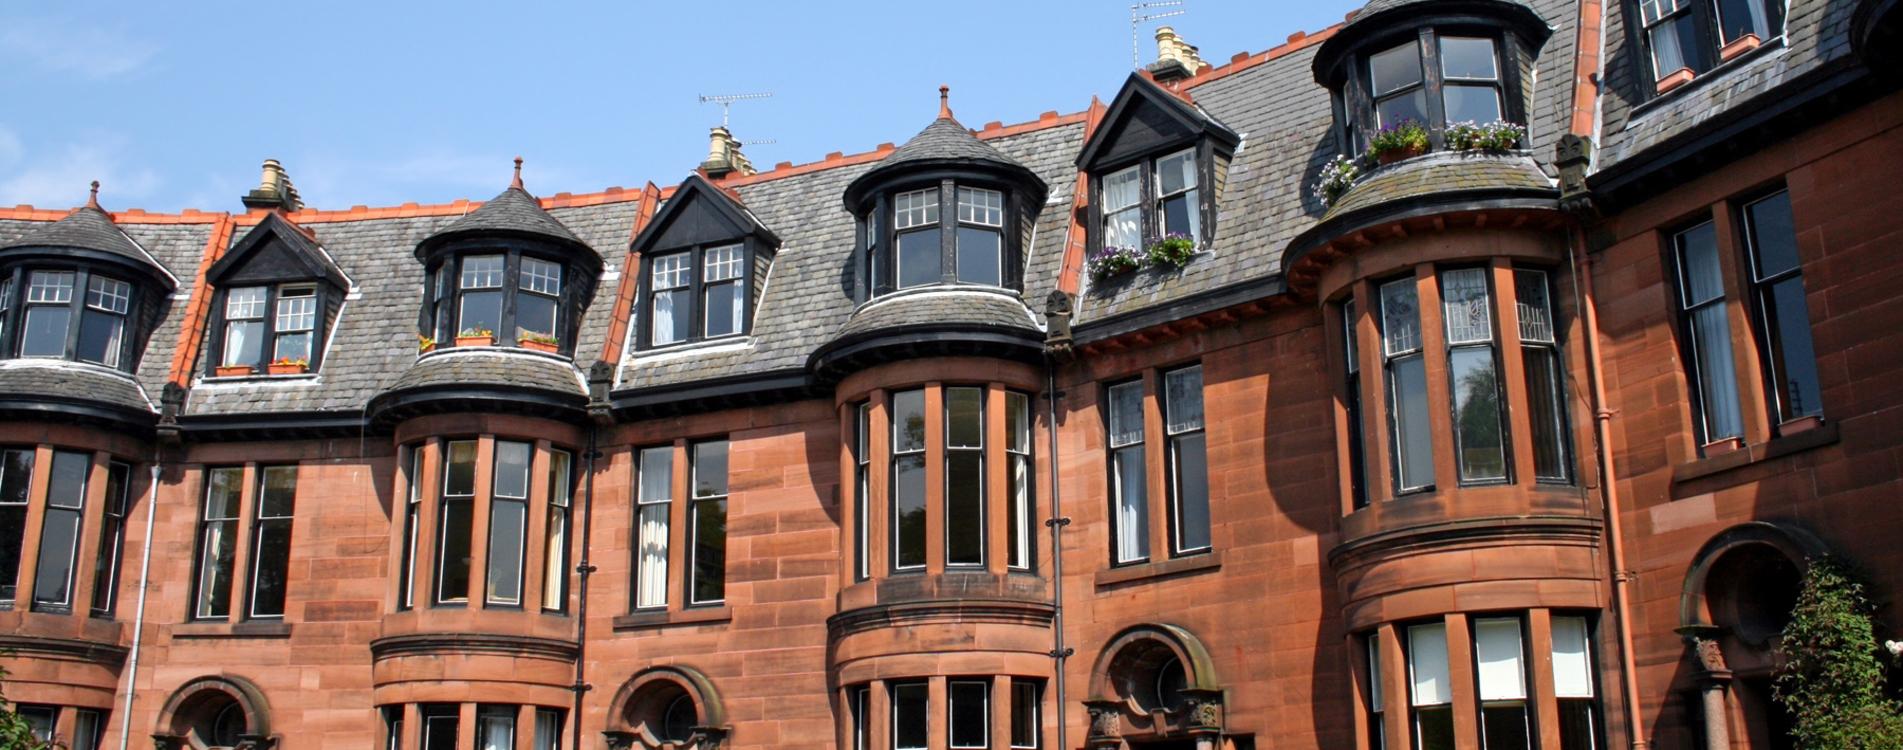 Best Property Factor Glasgow